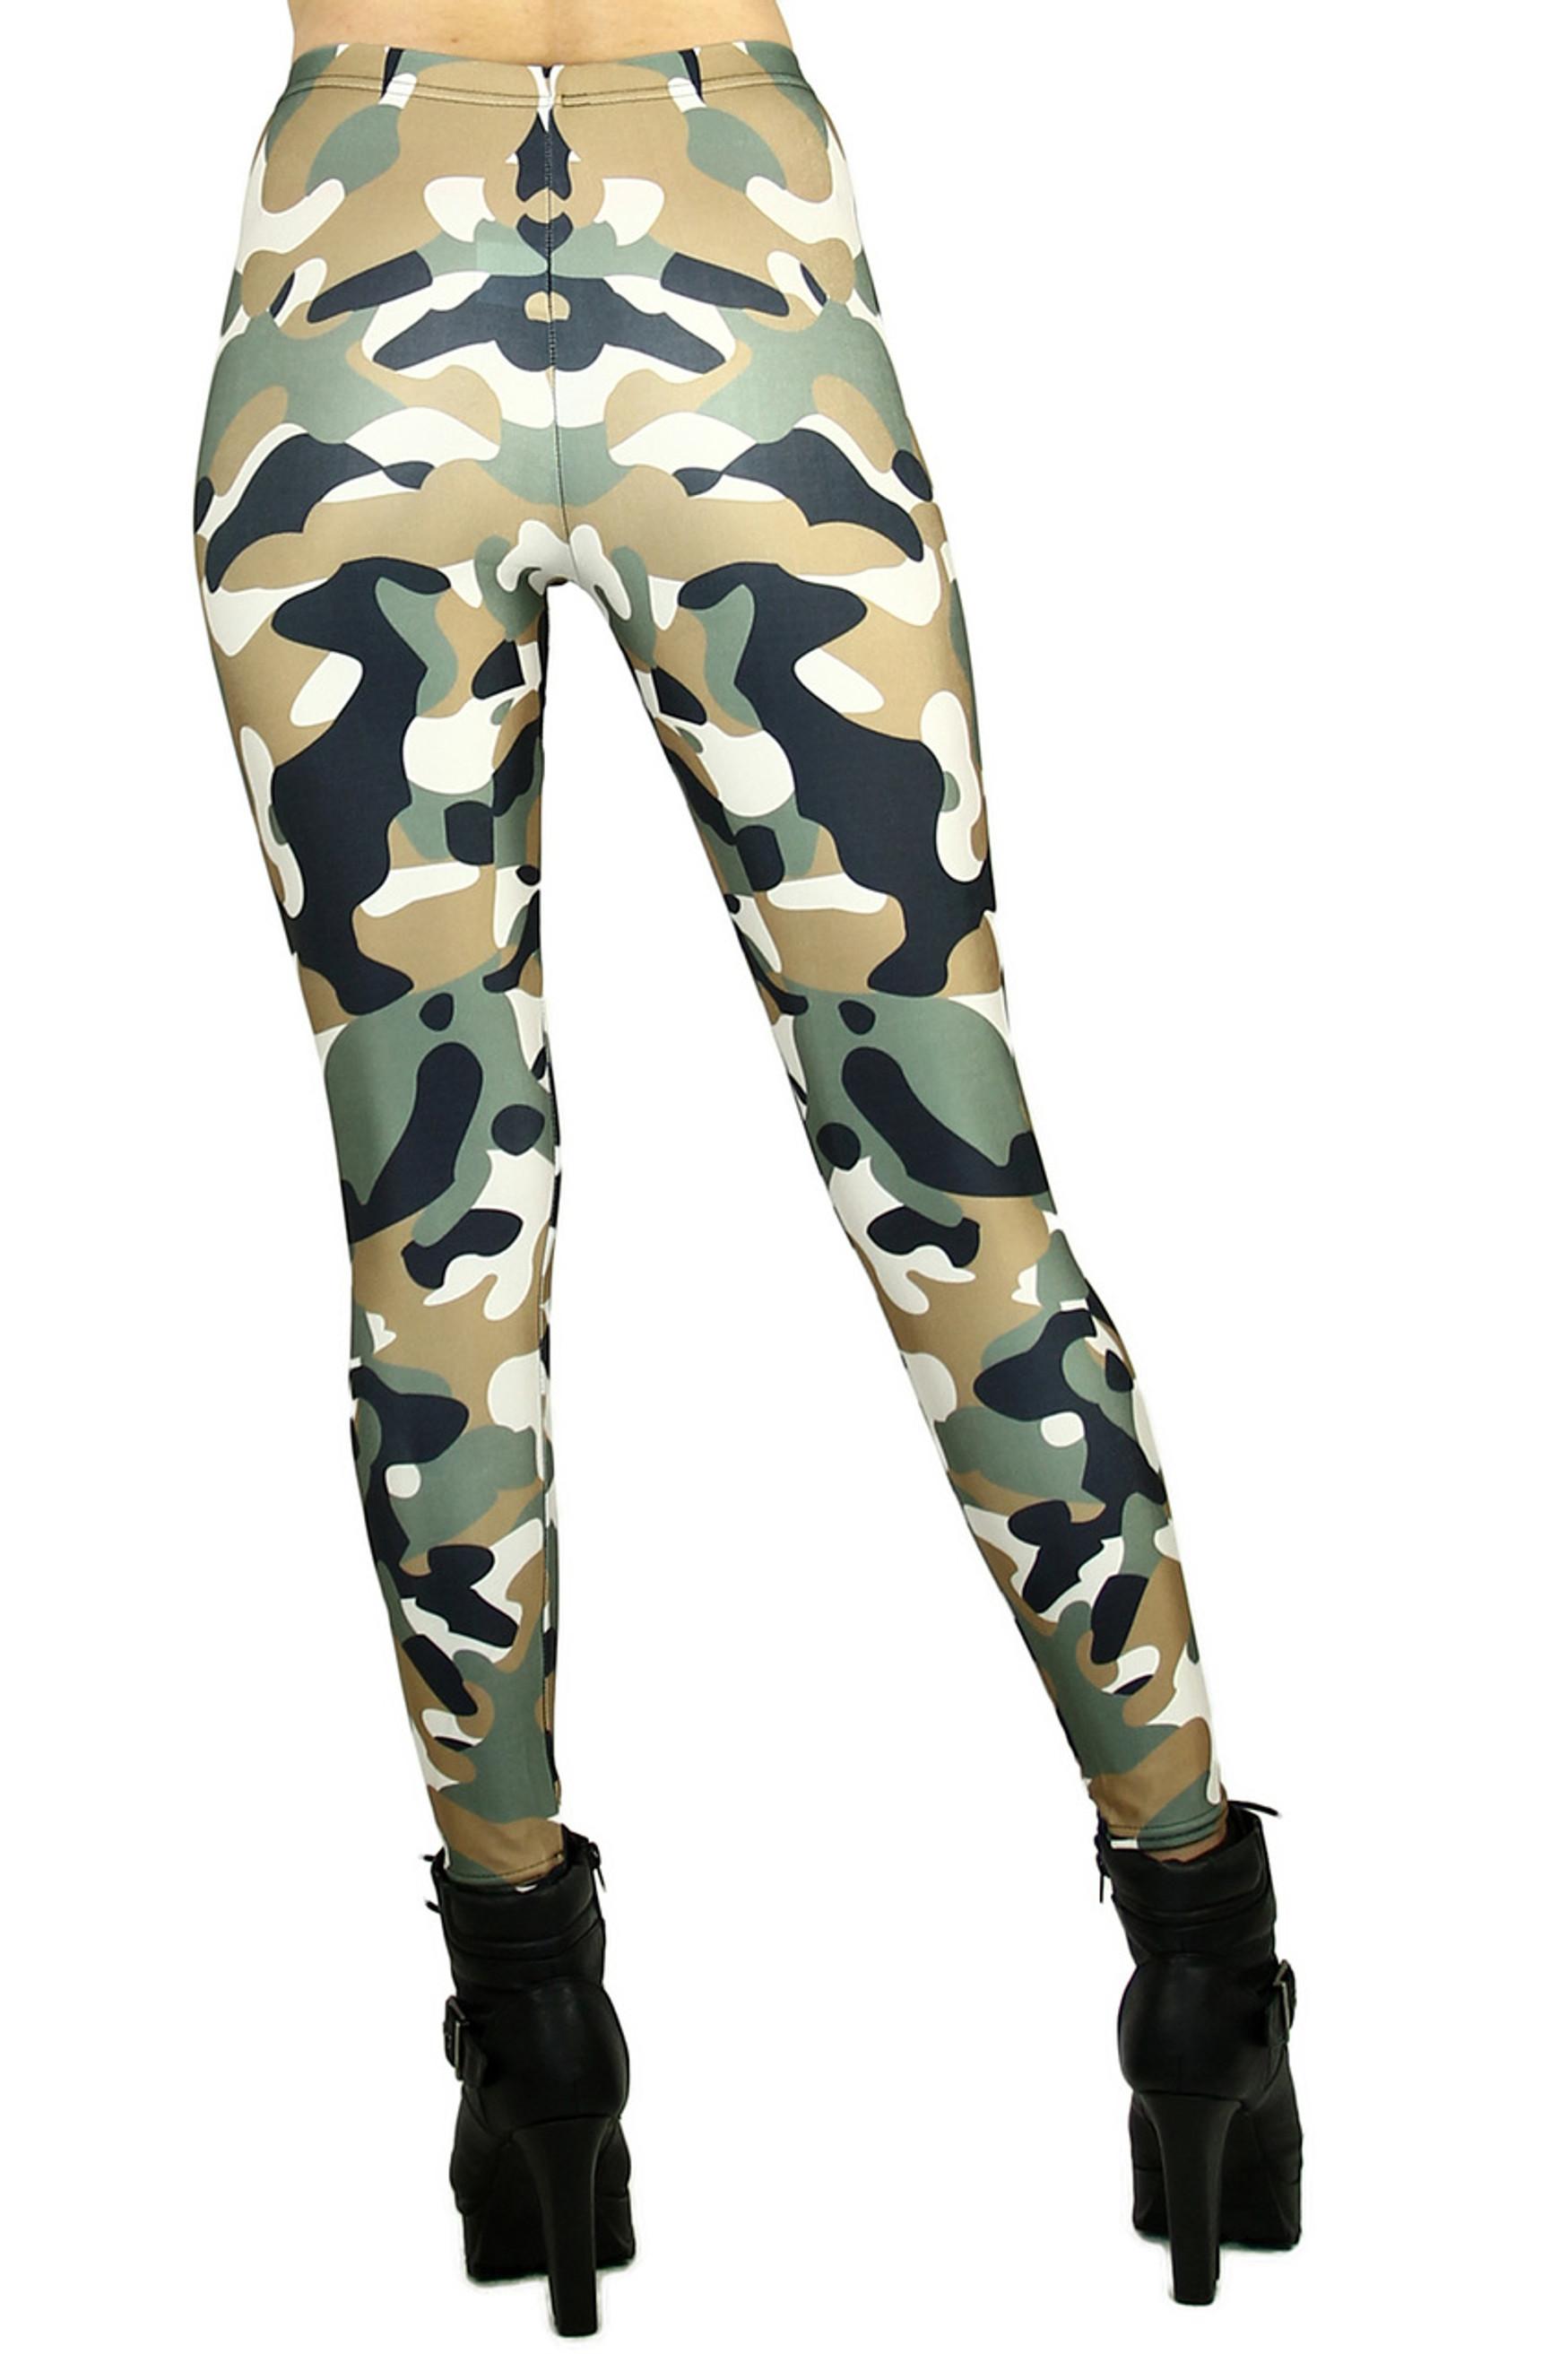 Incognito Camouflage Leggings - Plus Size